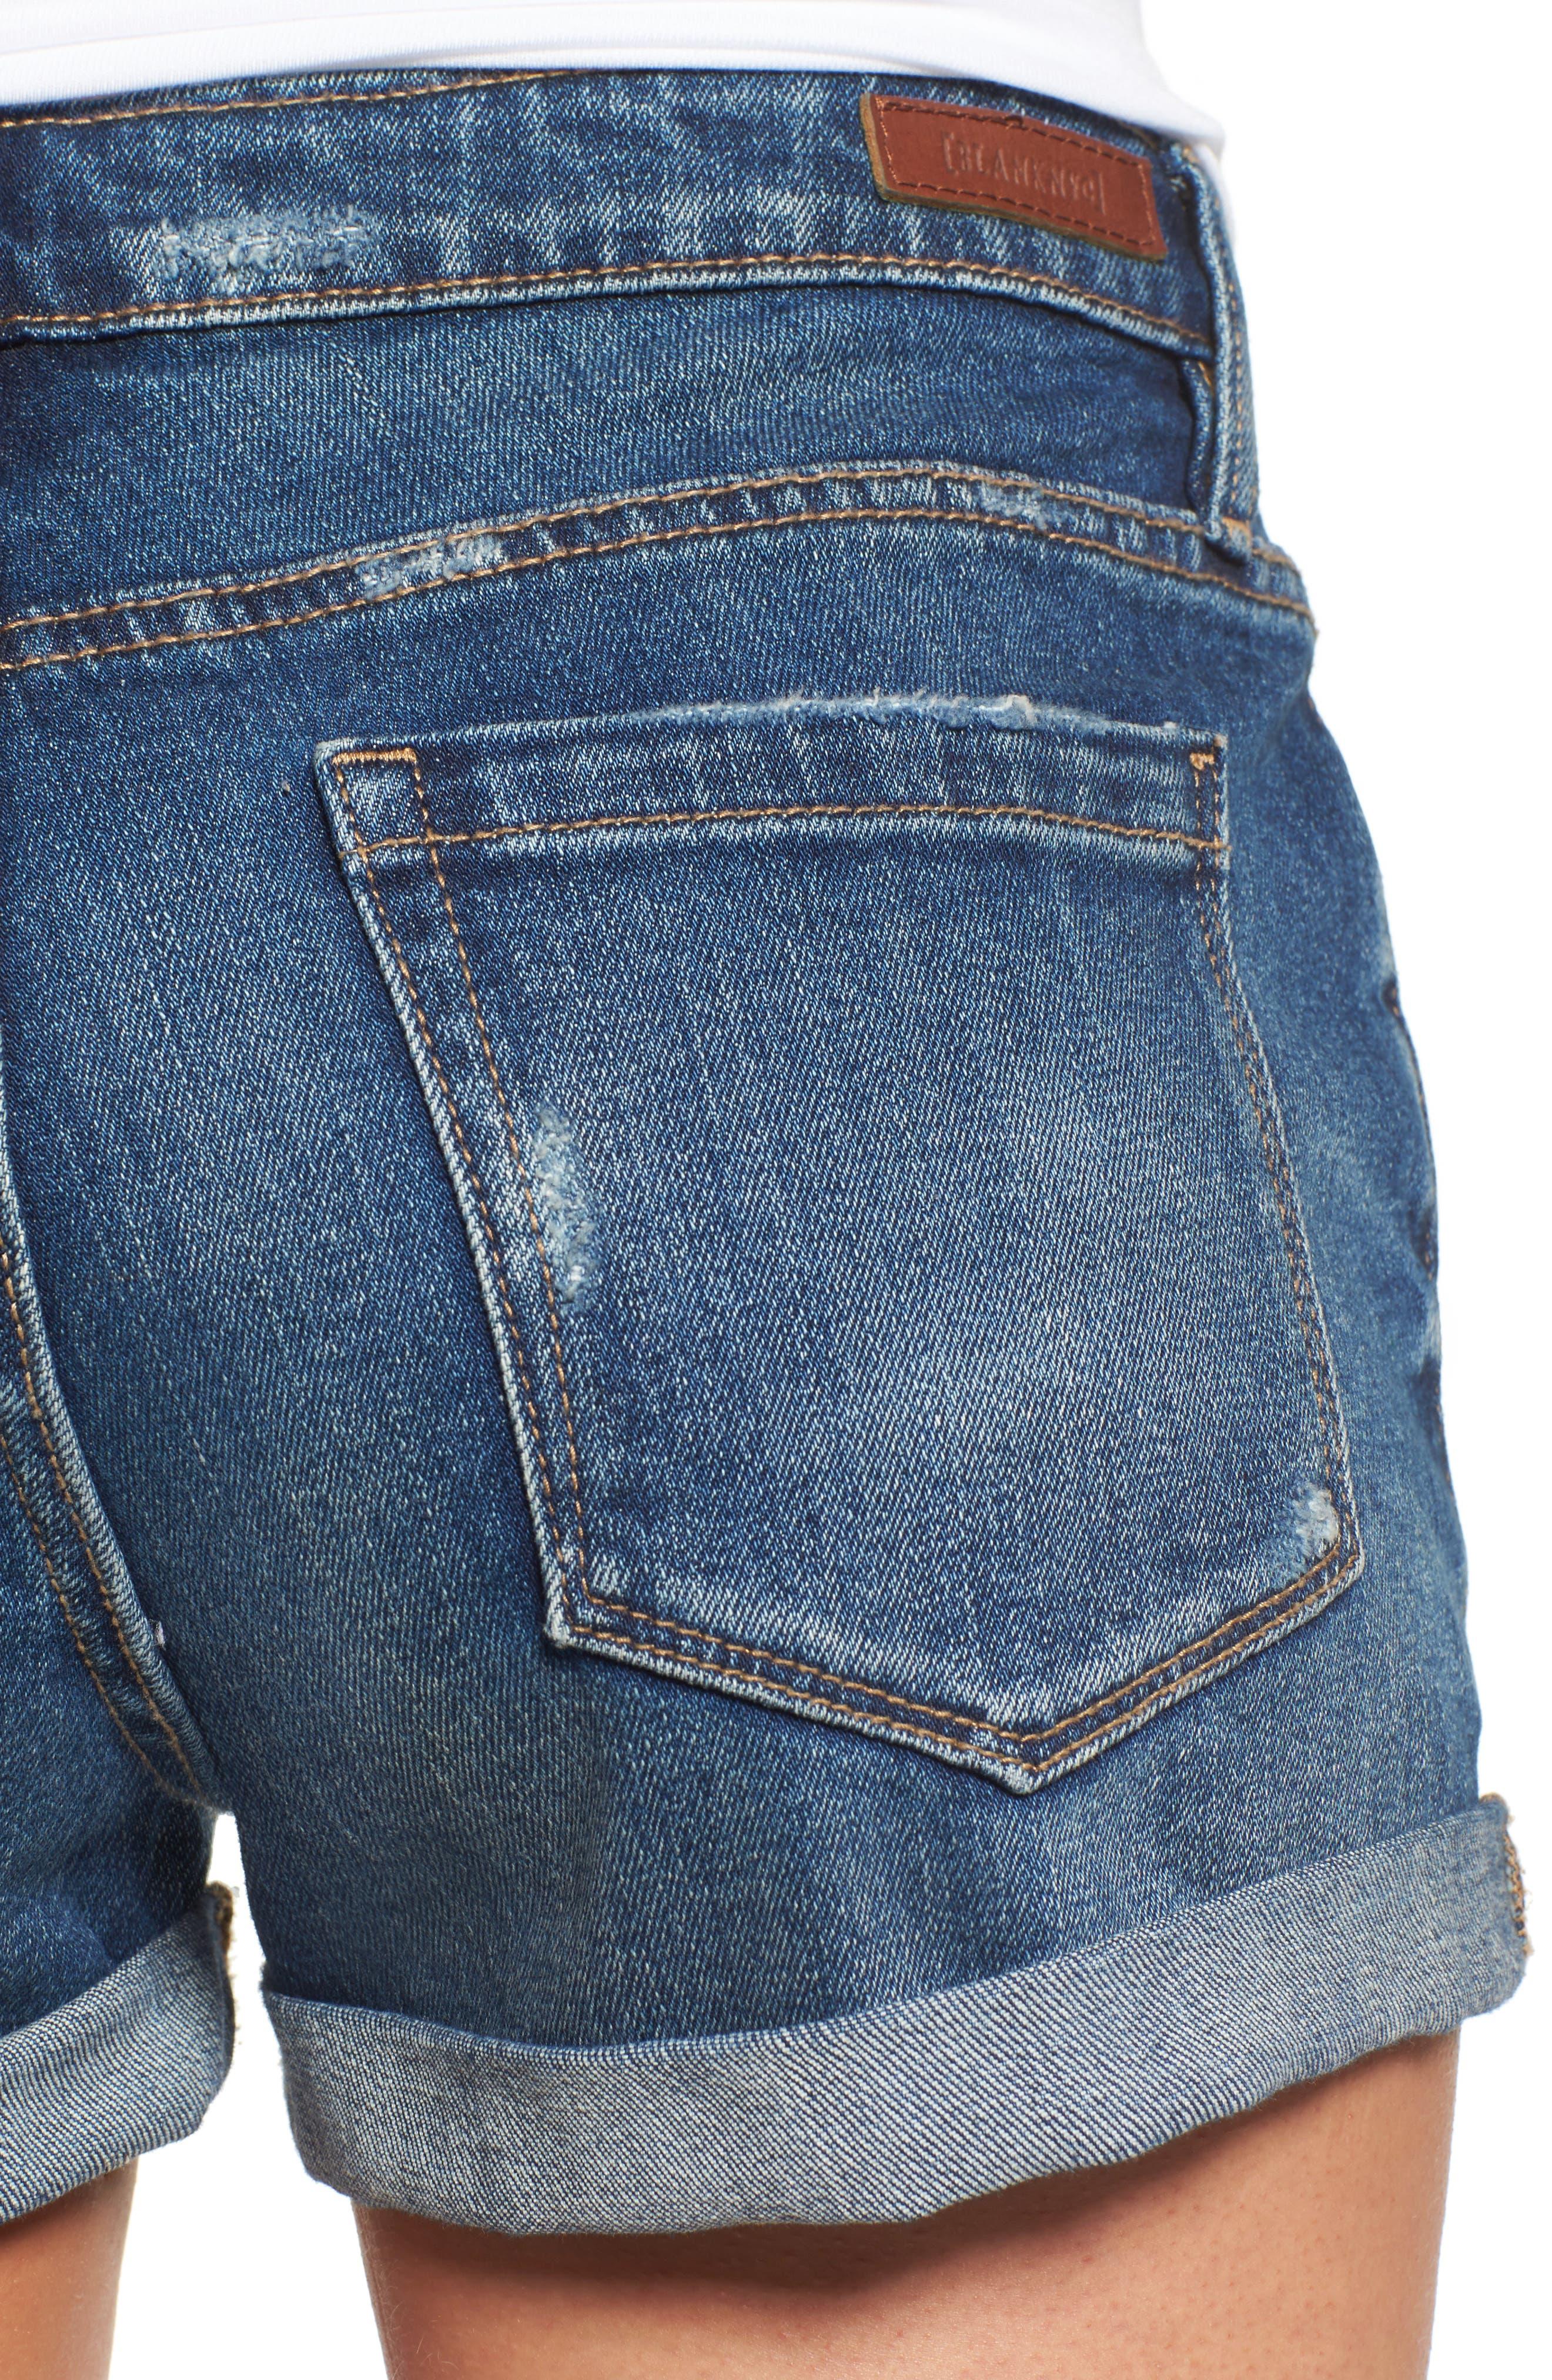 BLANKNYC, Boyfriend Denim Shorts, Alternate thumbnail 5, color, DRESS DOWN